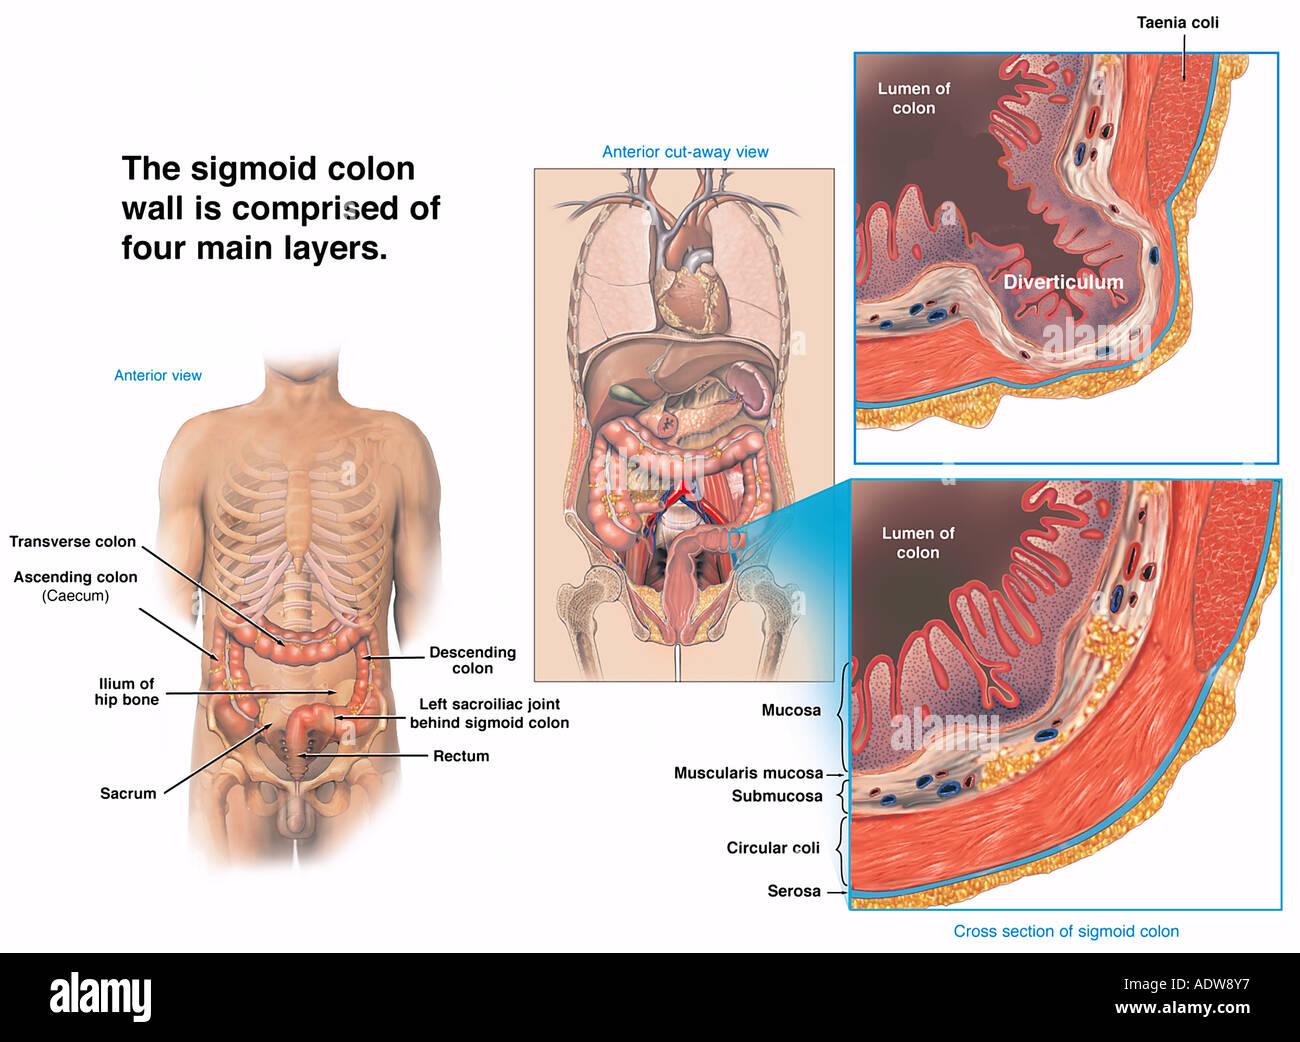 hight resolution of normal sigmoid colon wall vs sigmoid bowel diverticulum stock image